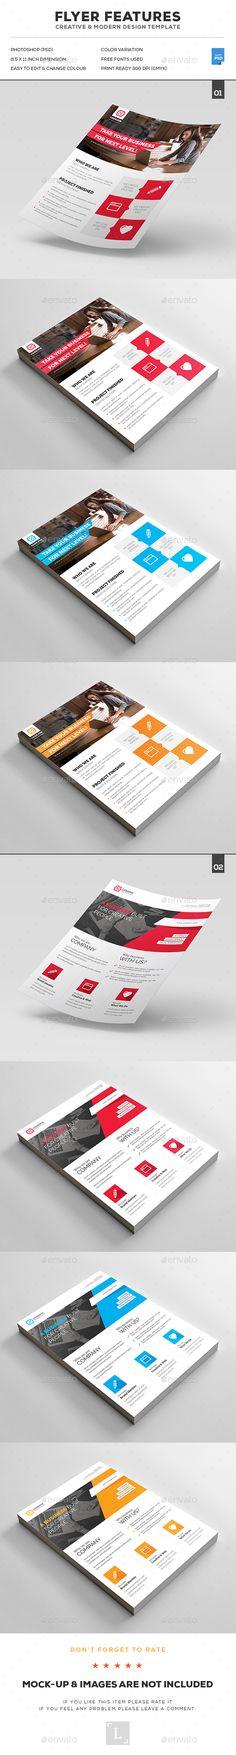 Corporate Flyer Design Bundle - Corporate Flyers Template PSD. Download here: http://graphicriver.net/item/corporate-flyer-bundle/16921669?ref=yinkira